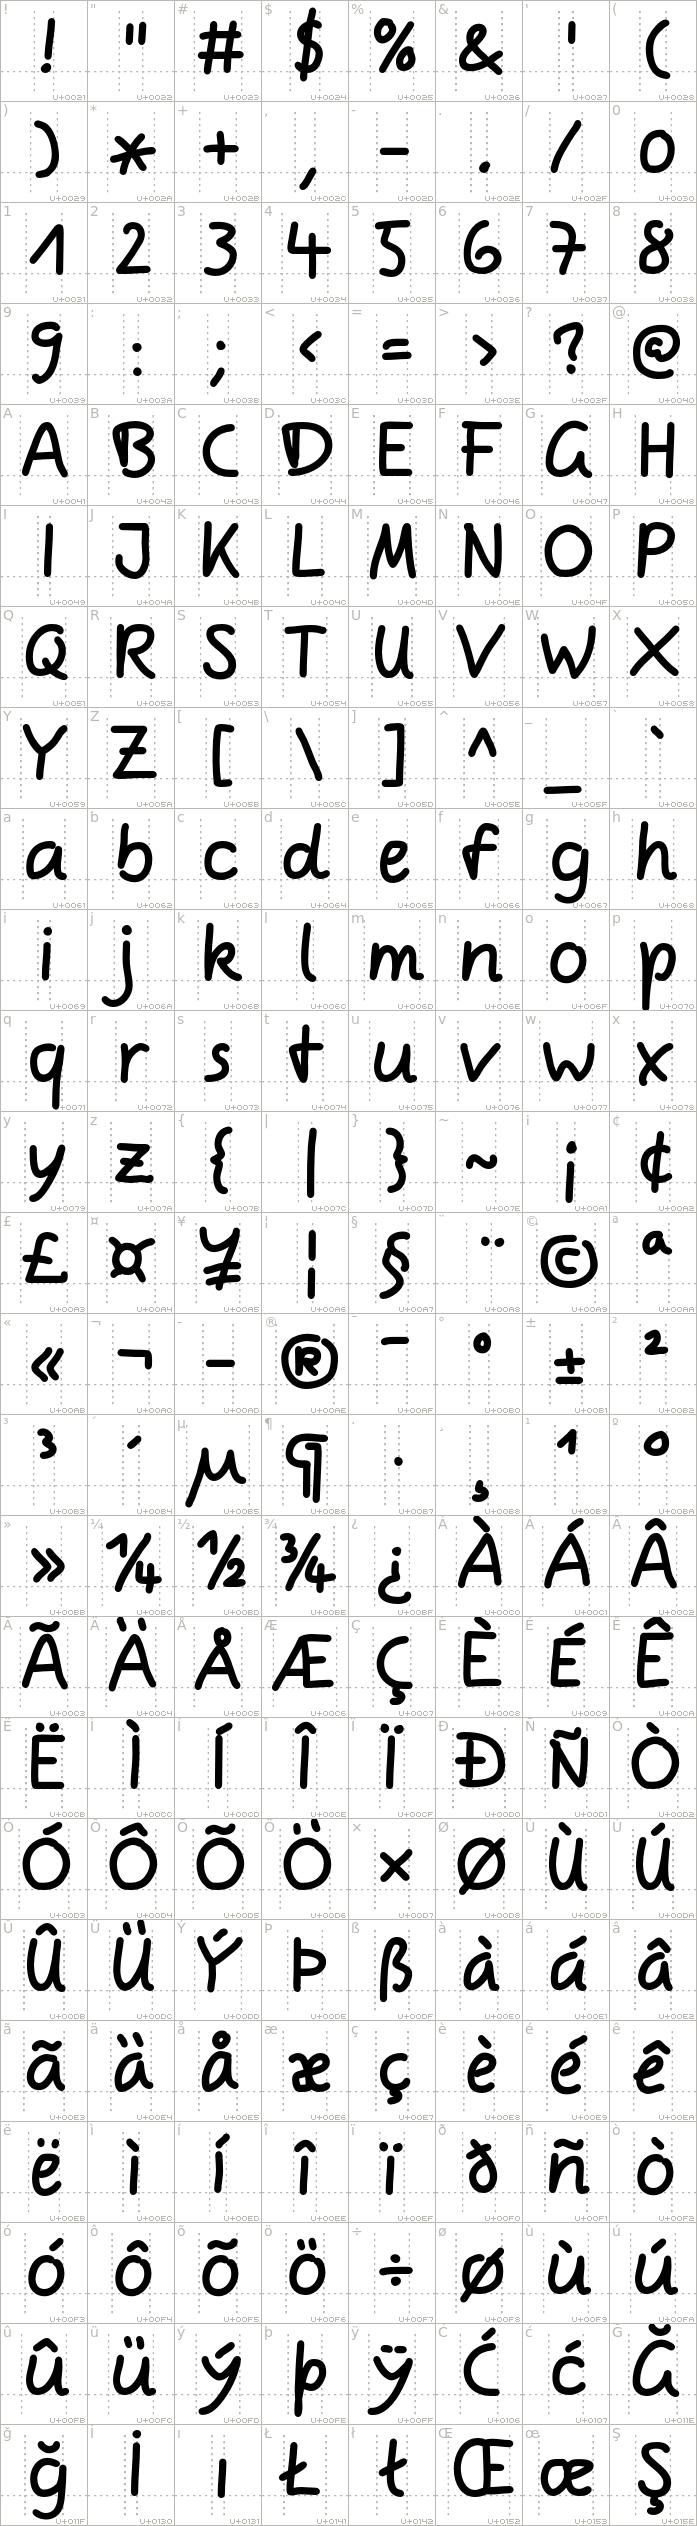 comic-jens.jens.character-map-1